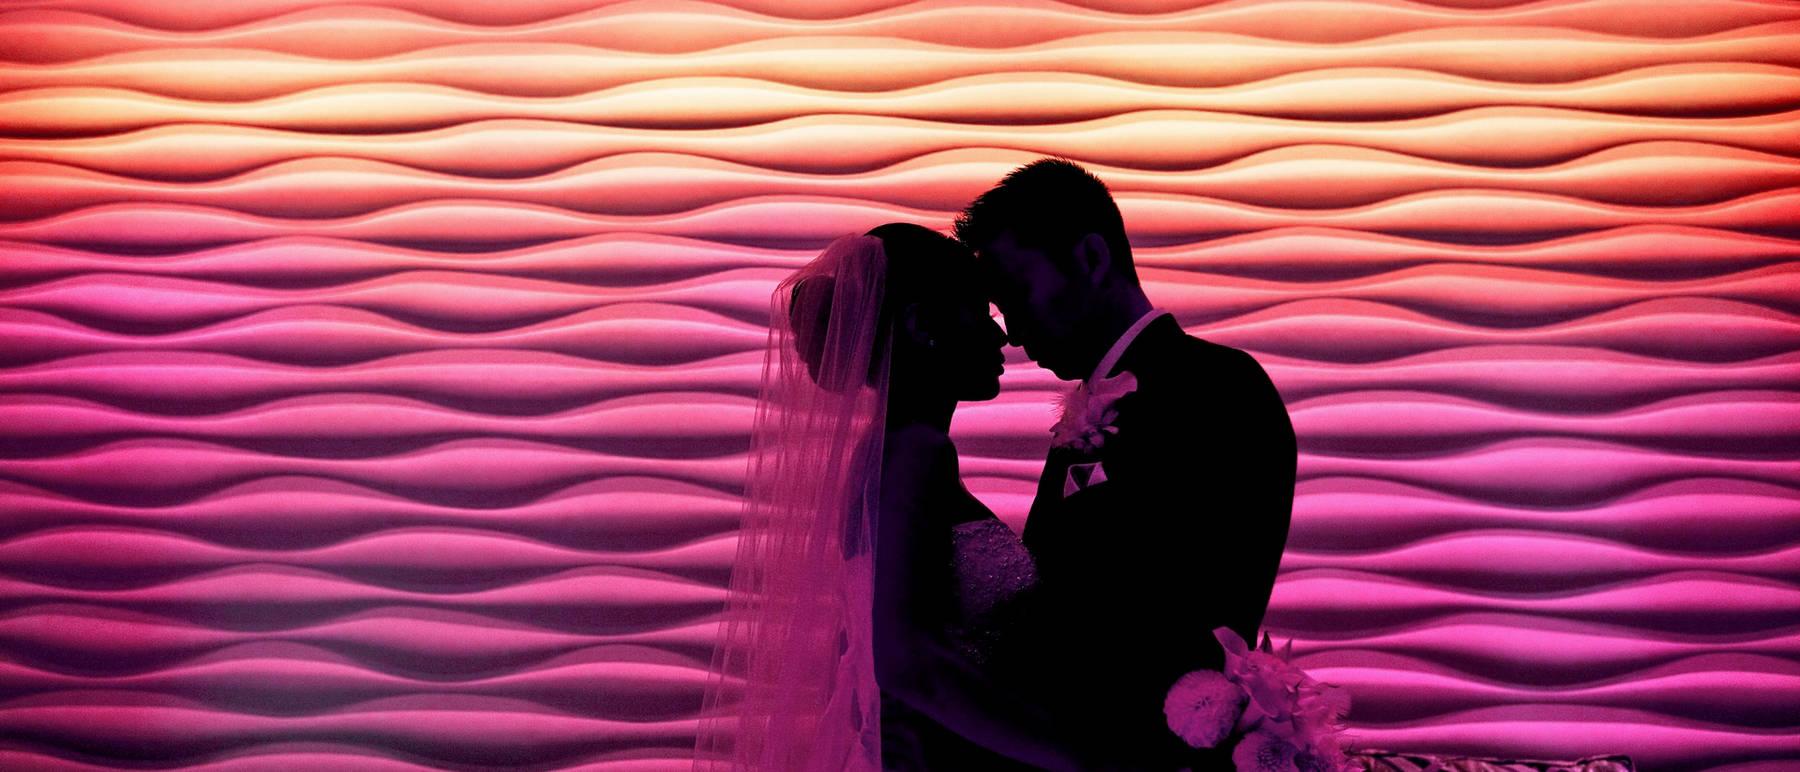 johnandjoseph-wedding-photographer-hz-slider-146